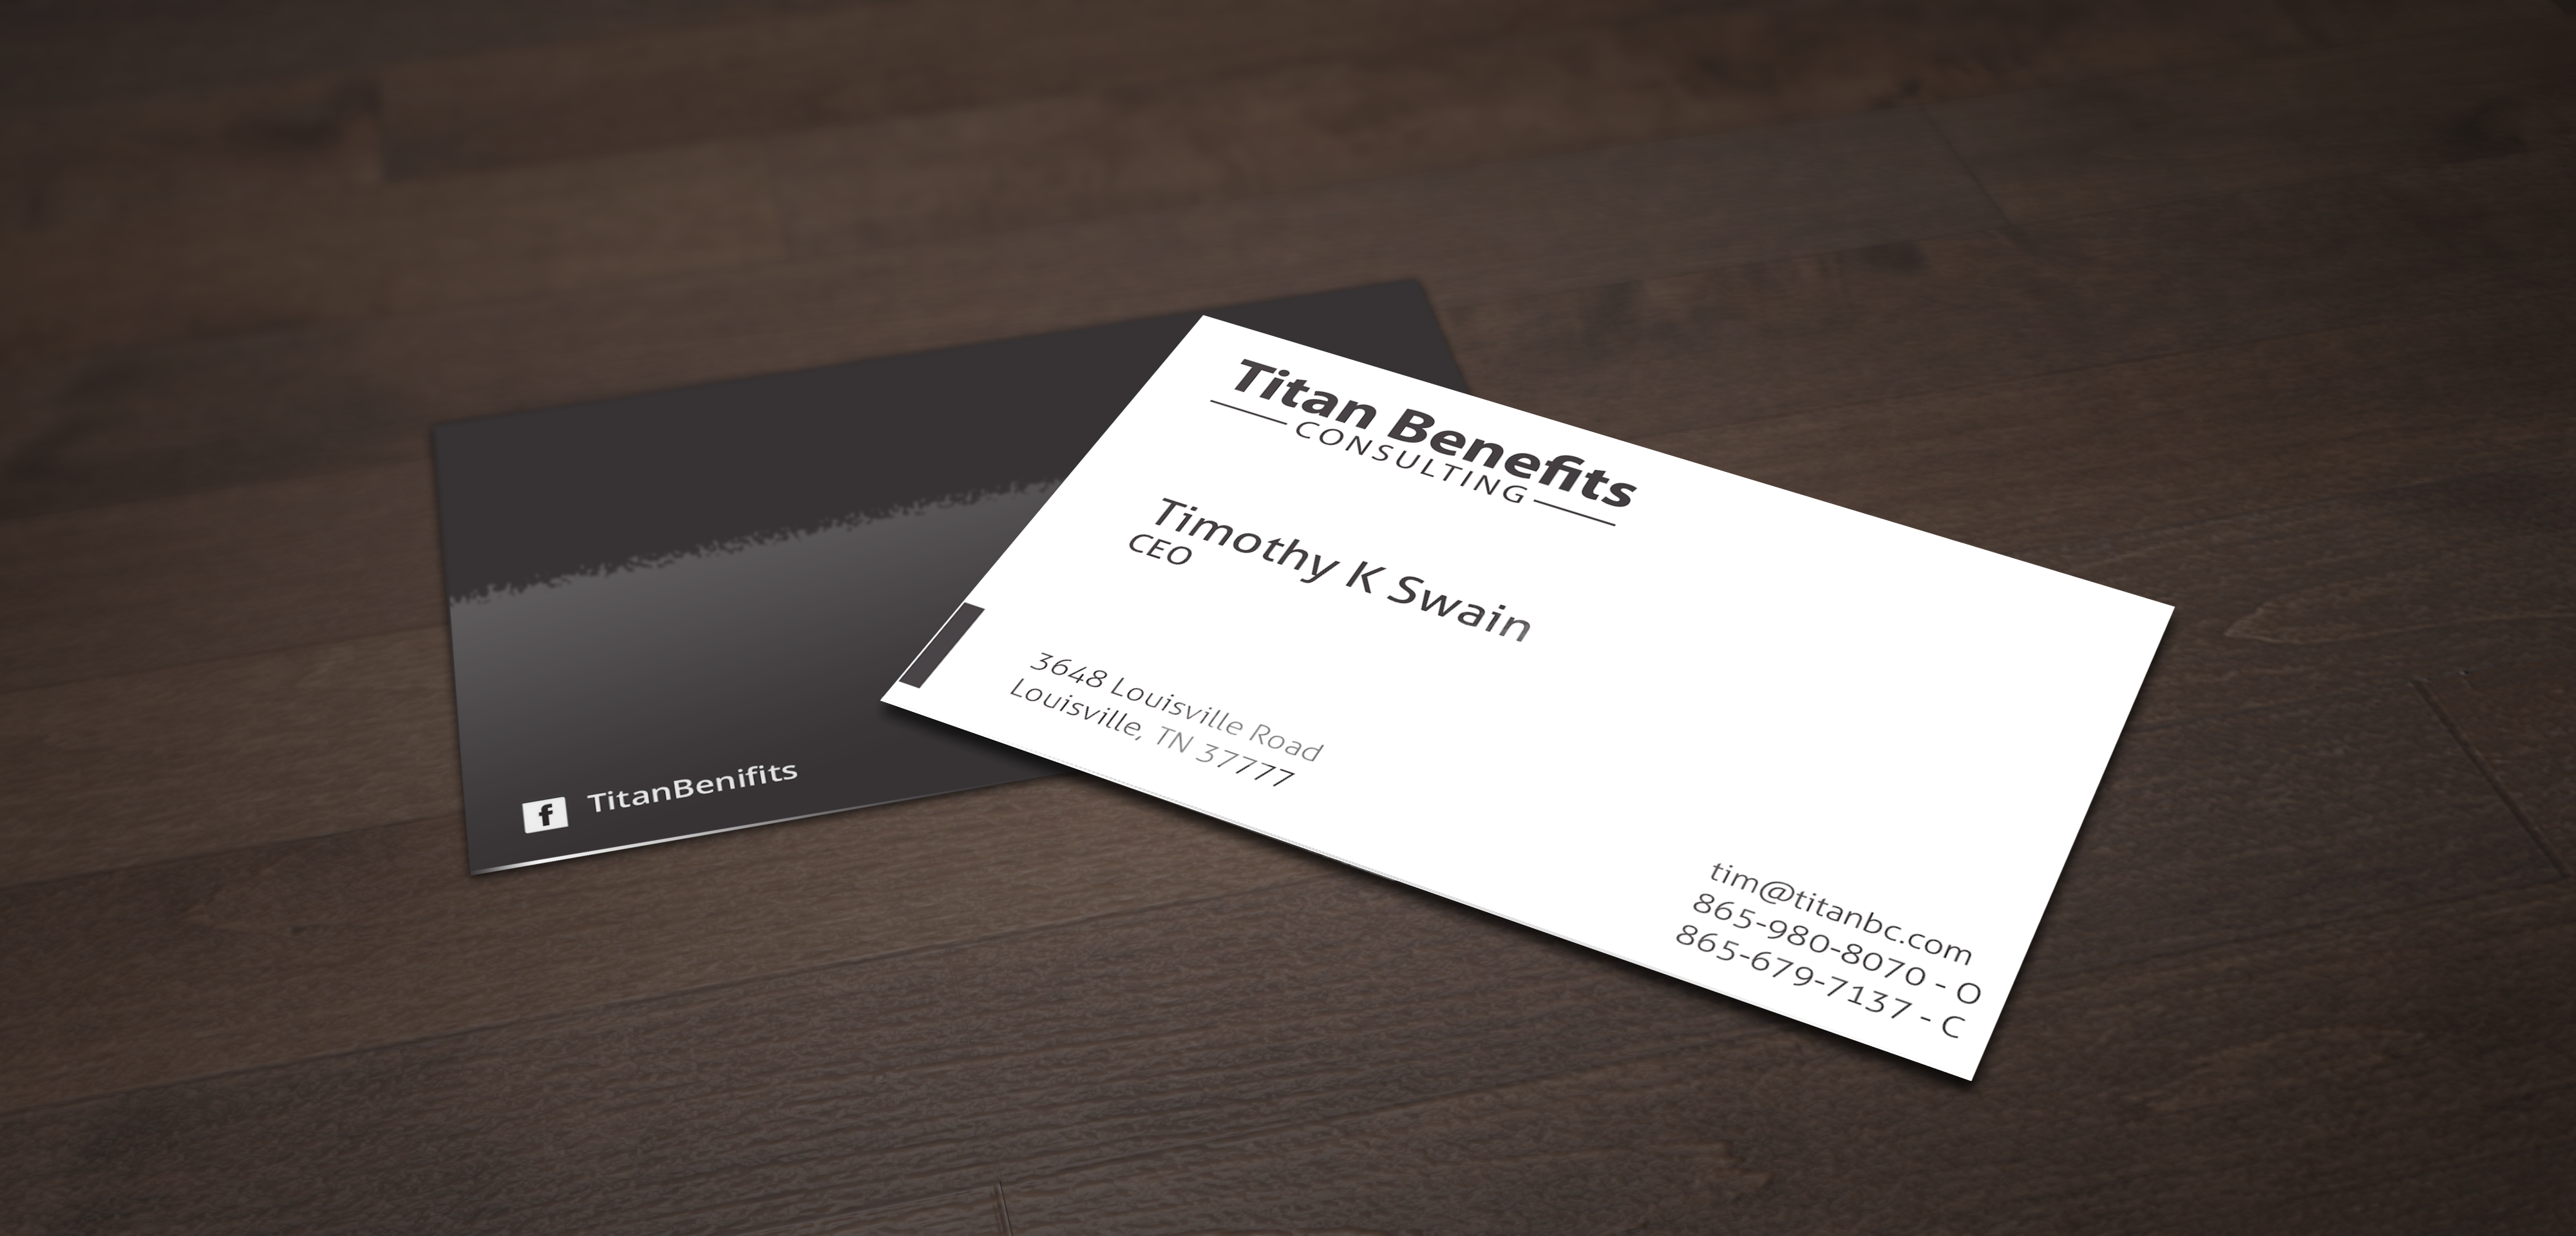 Insurance business card design for titan benefits by creative5 business card design by creative5 for titan benefits design 9331755 colourmoves